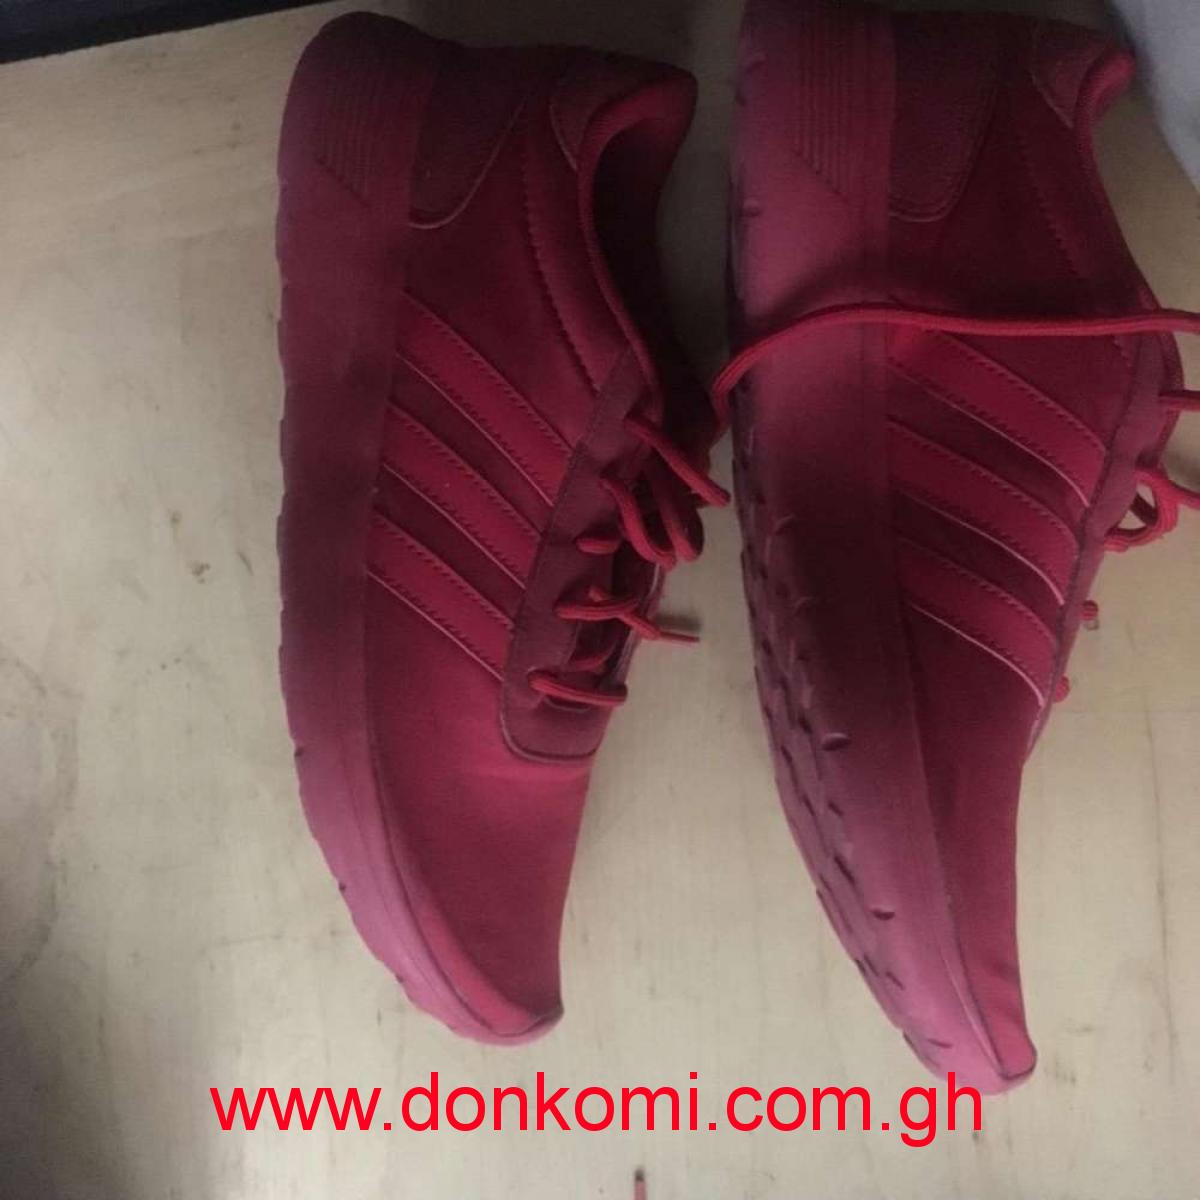 Adidas footwear 42 n half